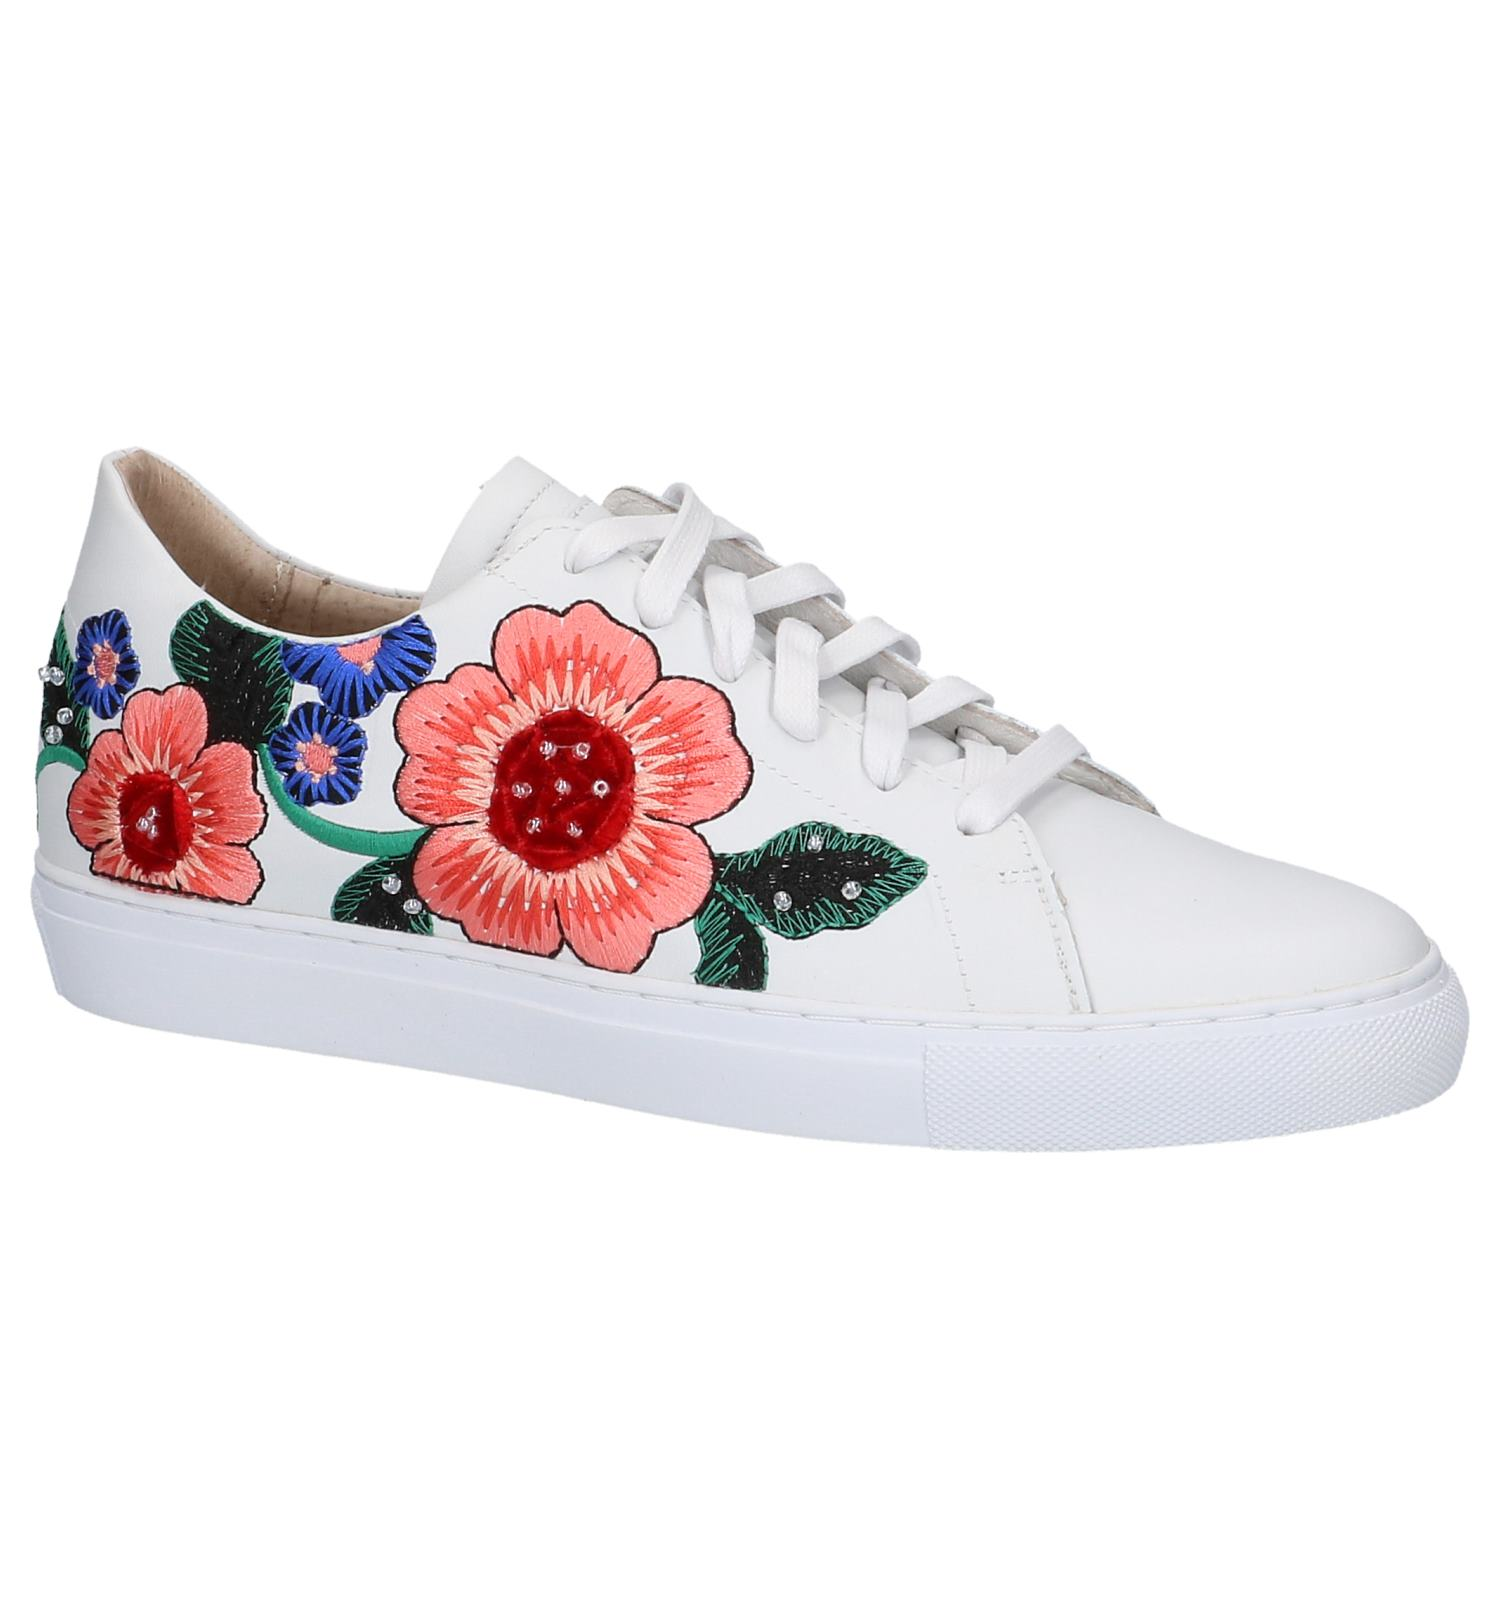 d23a4e0fa1f Witte Lage Geklede Sneakers met Bloemen Skechers California Luxury |  TORFS.BE | Gratis verzend en retour